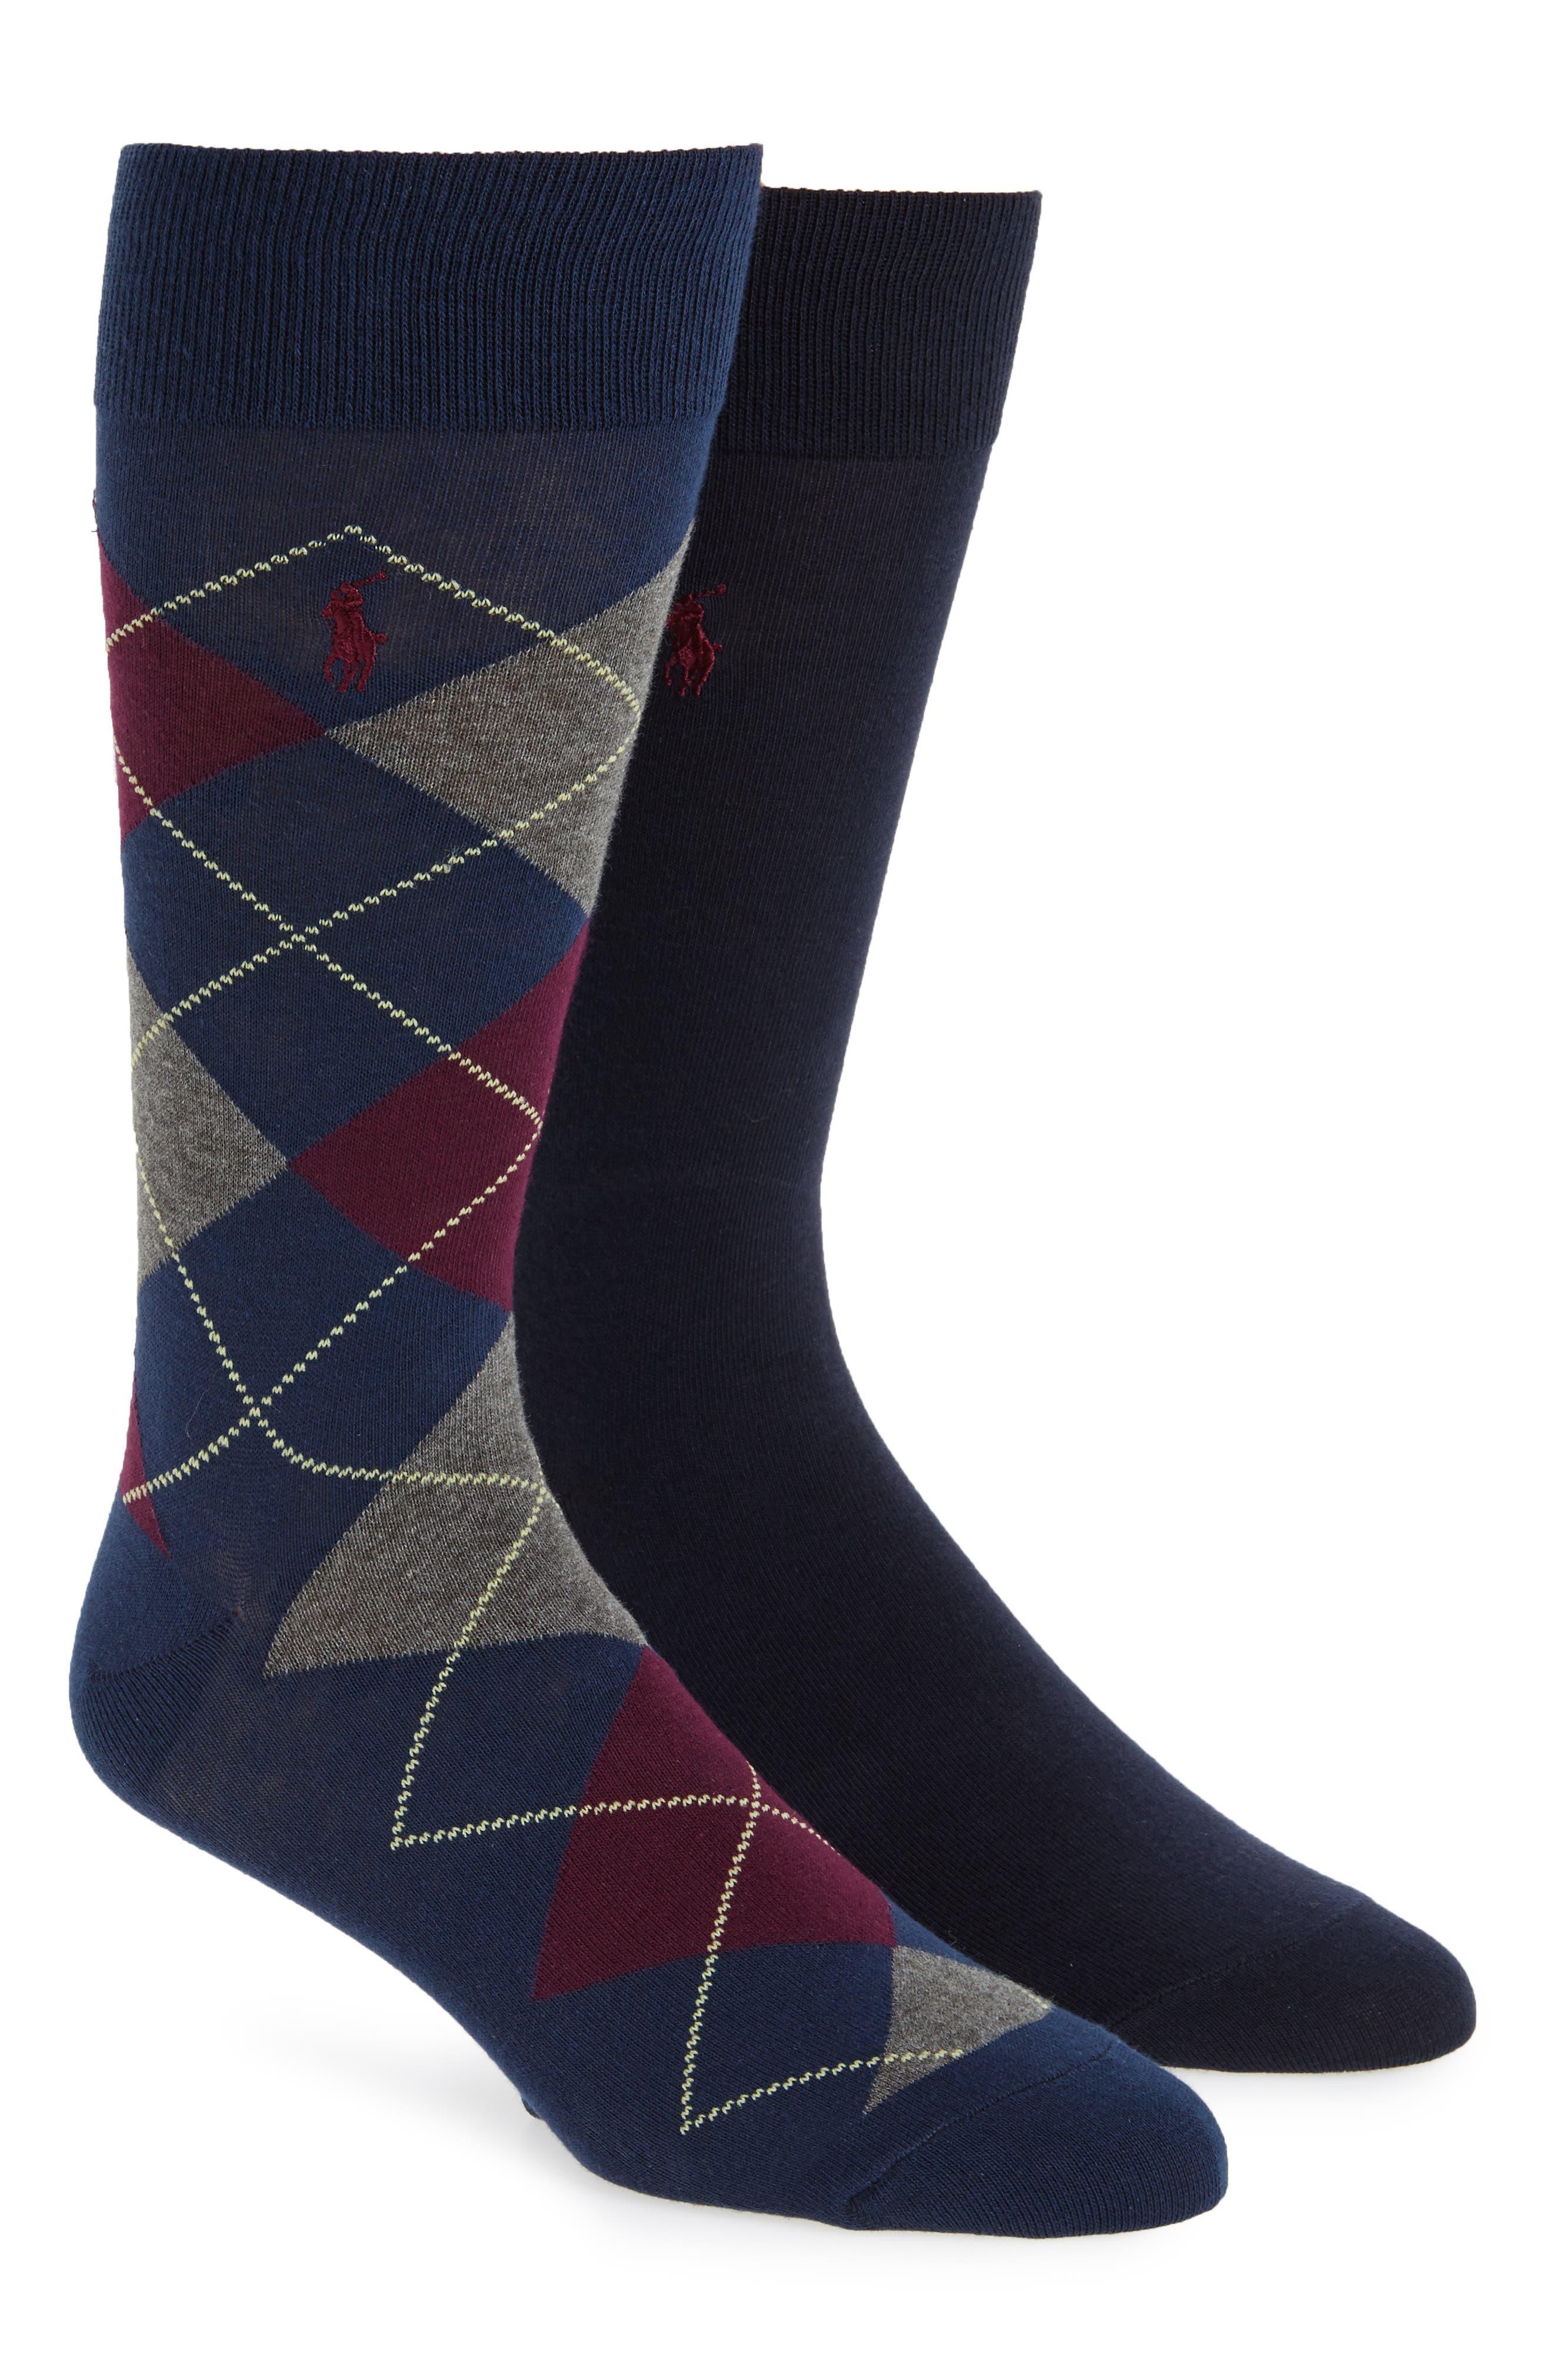 Cotton Blend Socks,                             Alternate thumbnail 2, color,                             499